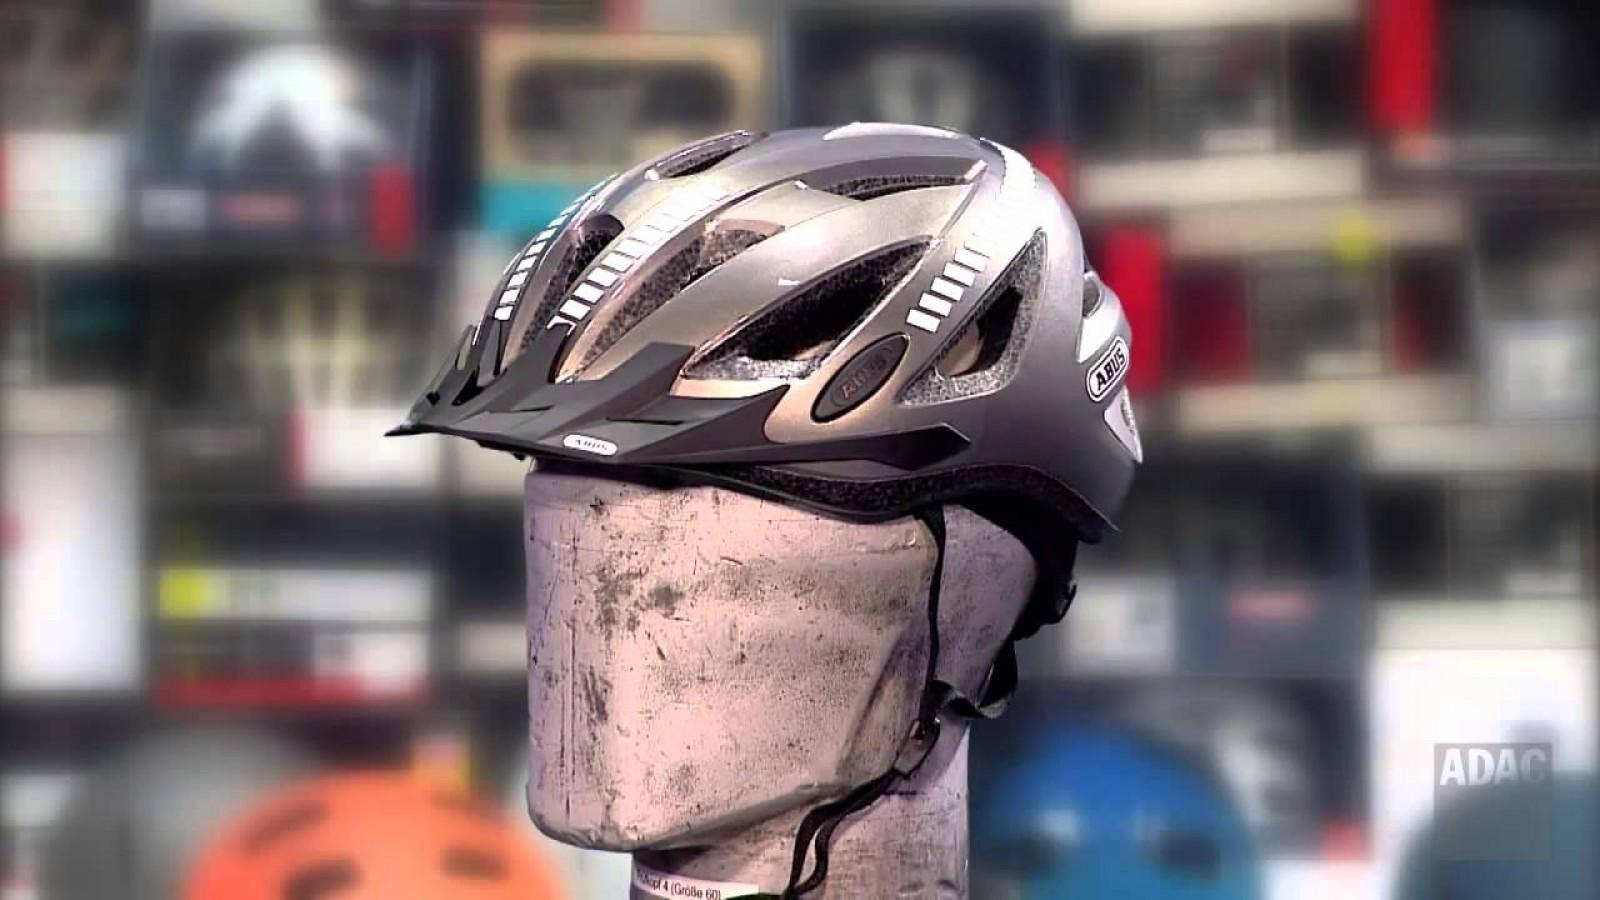 casco-ciclismo-caducidad/